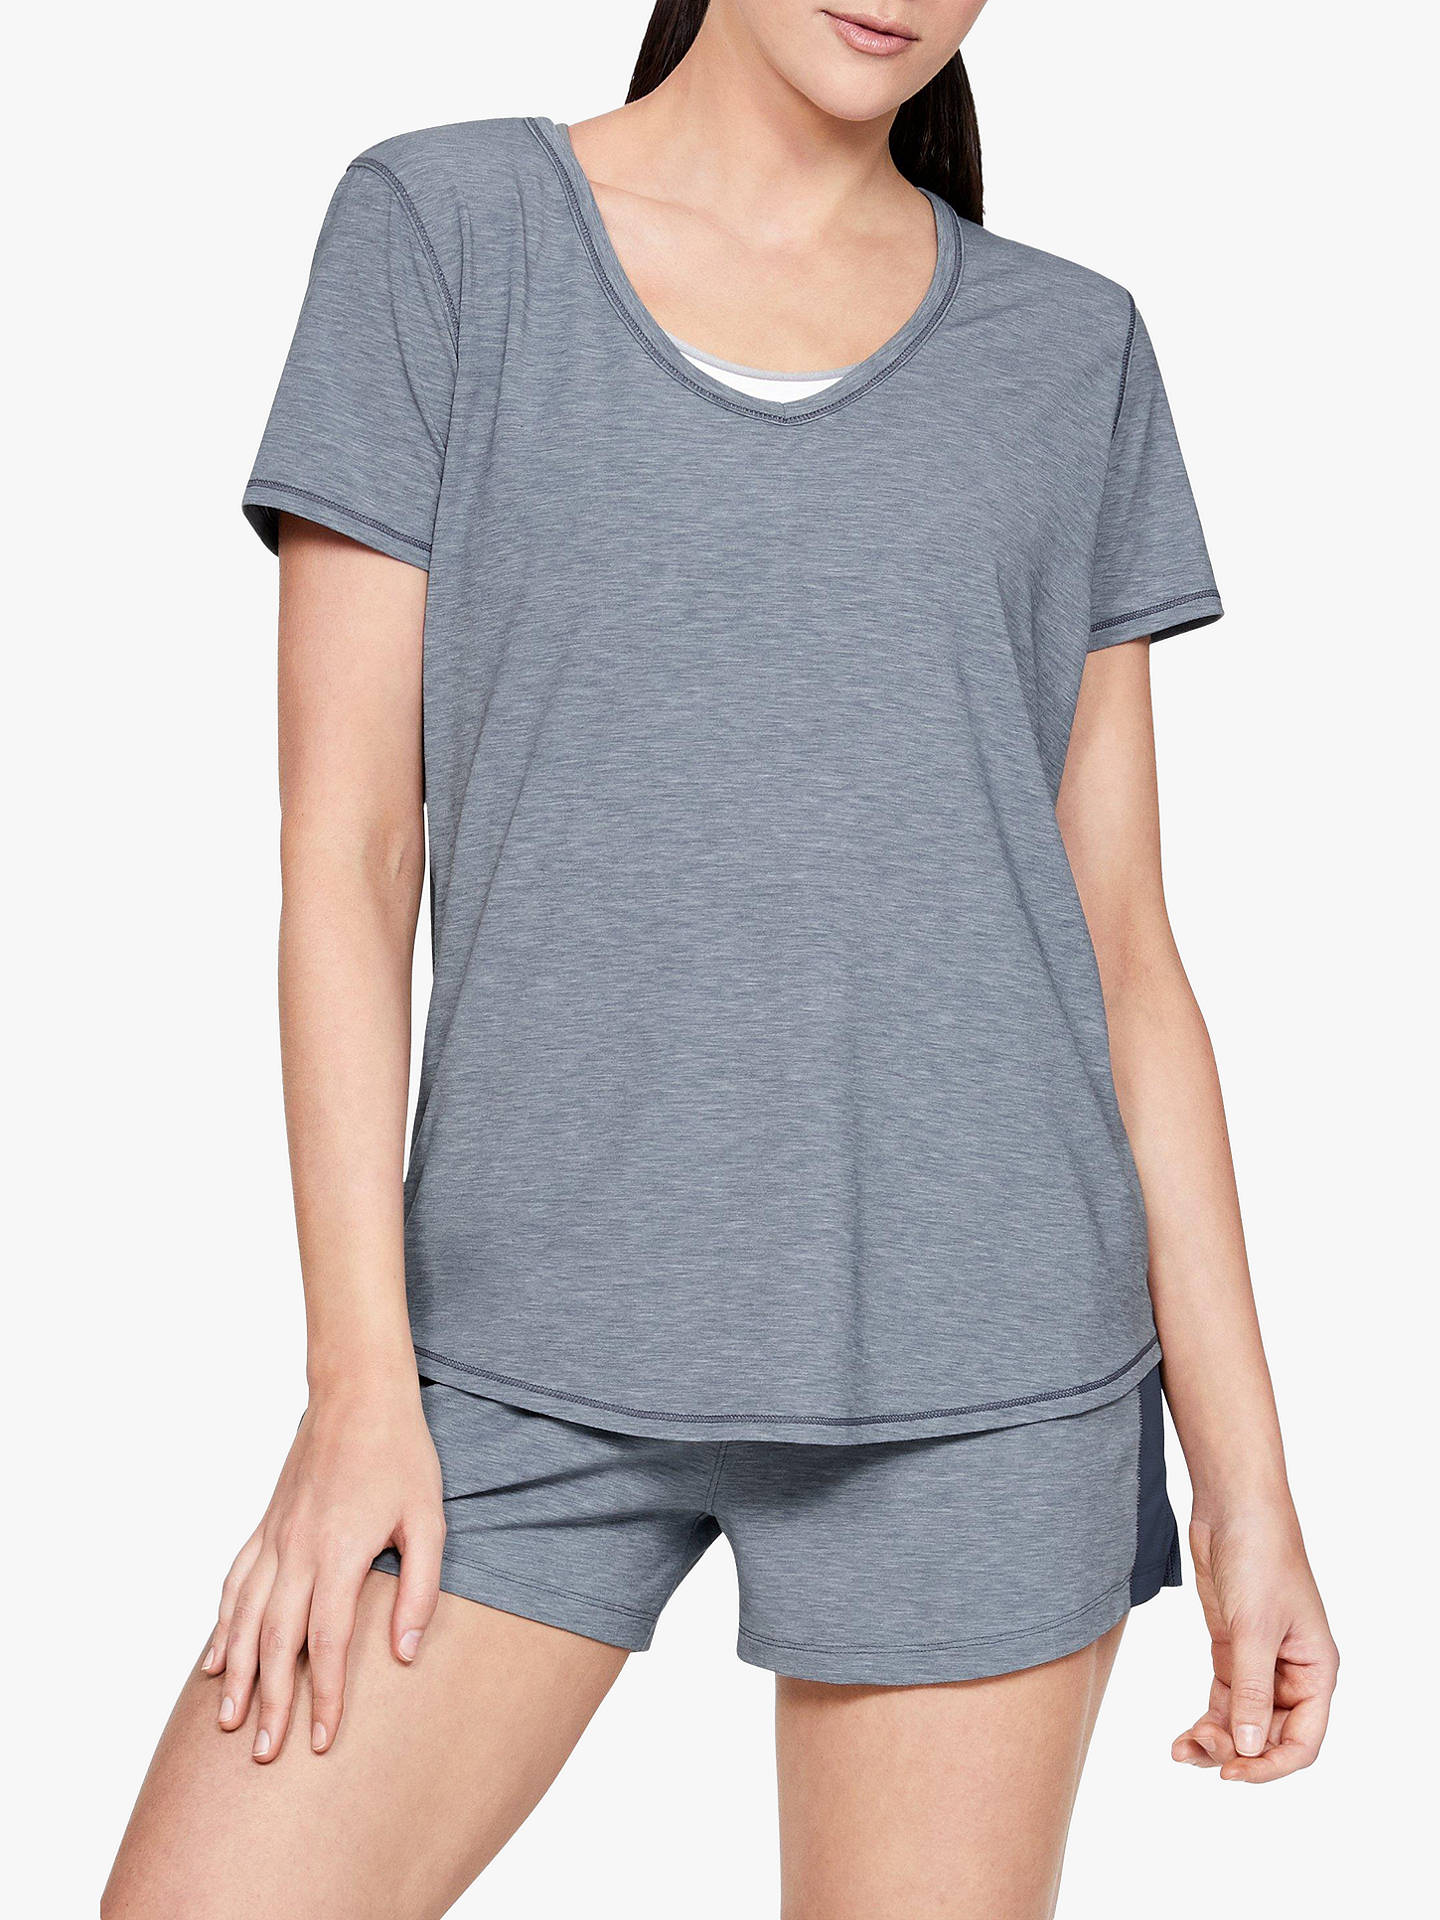 333db96416 Under Armour Athlete Recovery Sleepwear T-Shirt, Grey/Metallic Silver